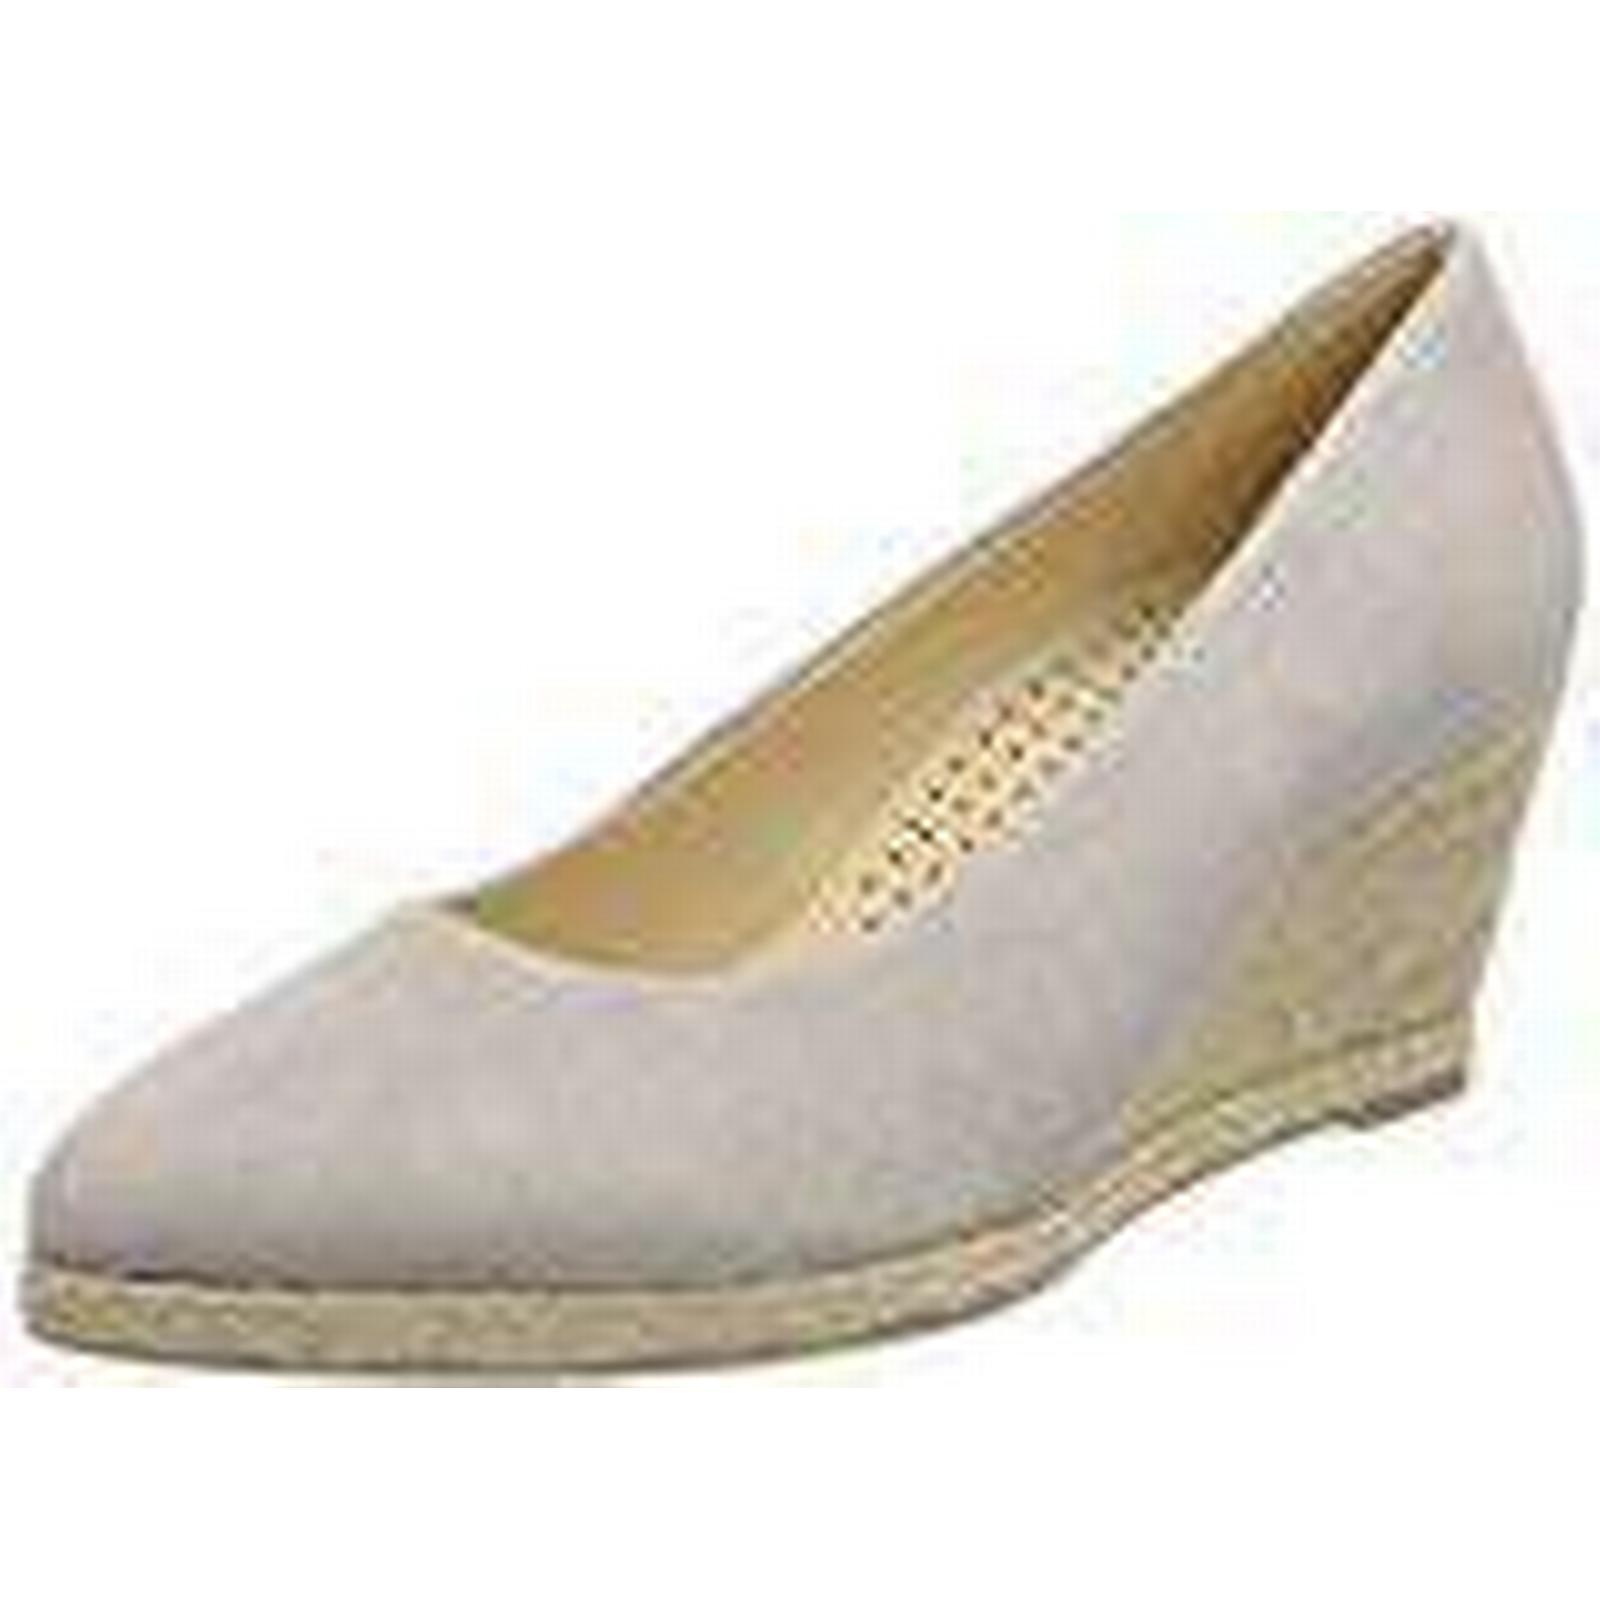 Gabor Women's Casual Closed Toe 7.5 Heels, Multicolour Puder 13, 7.5 Toe UK 7.5 UK ffbe81